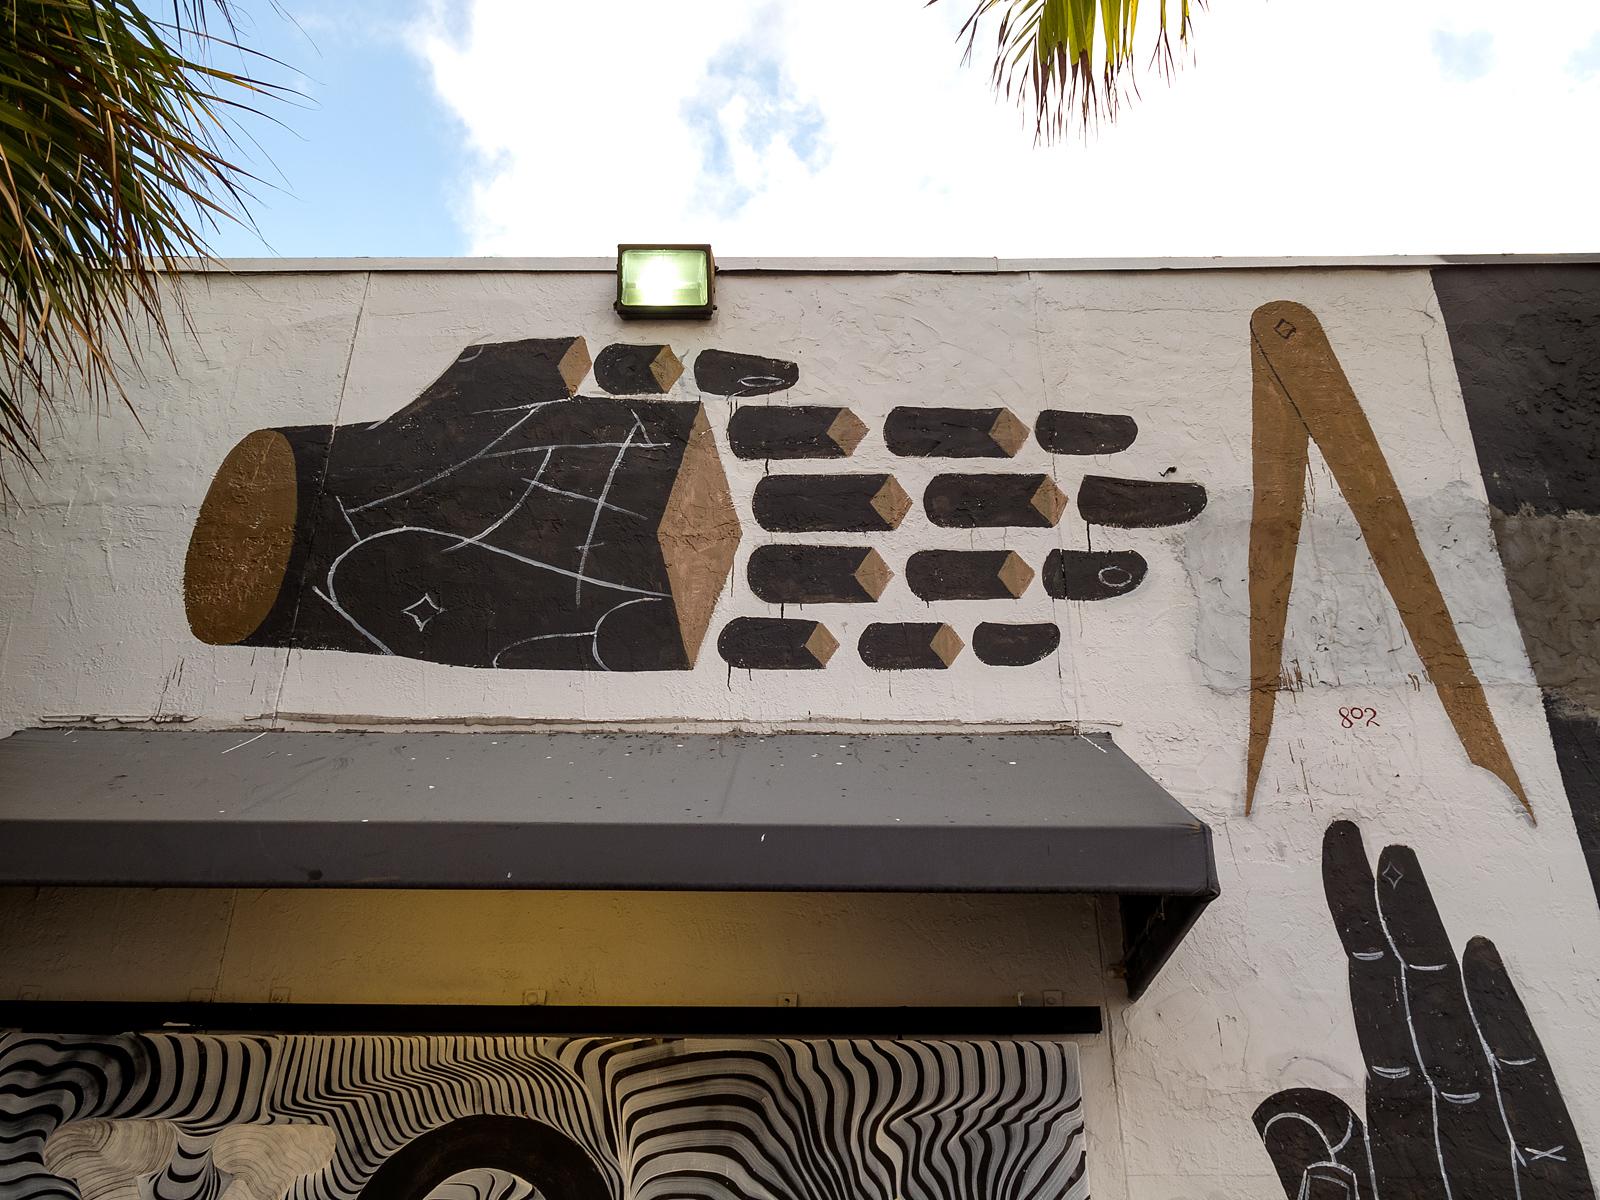 basik-new-mural-at-art-basel-2014-03